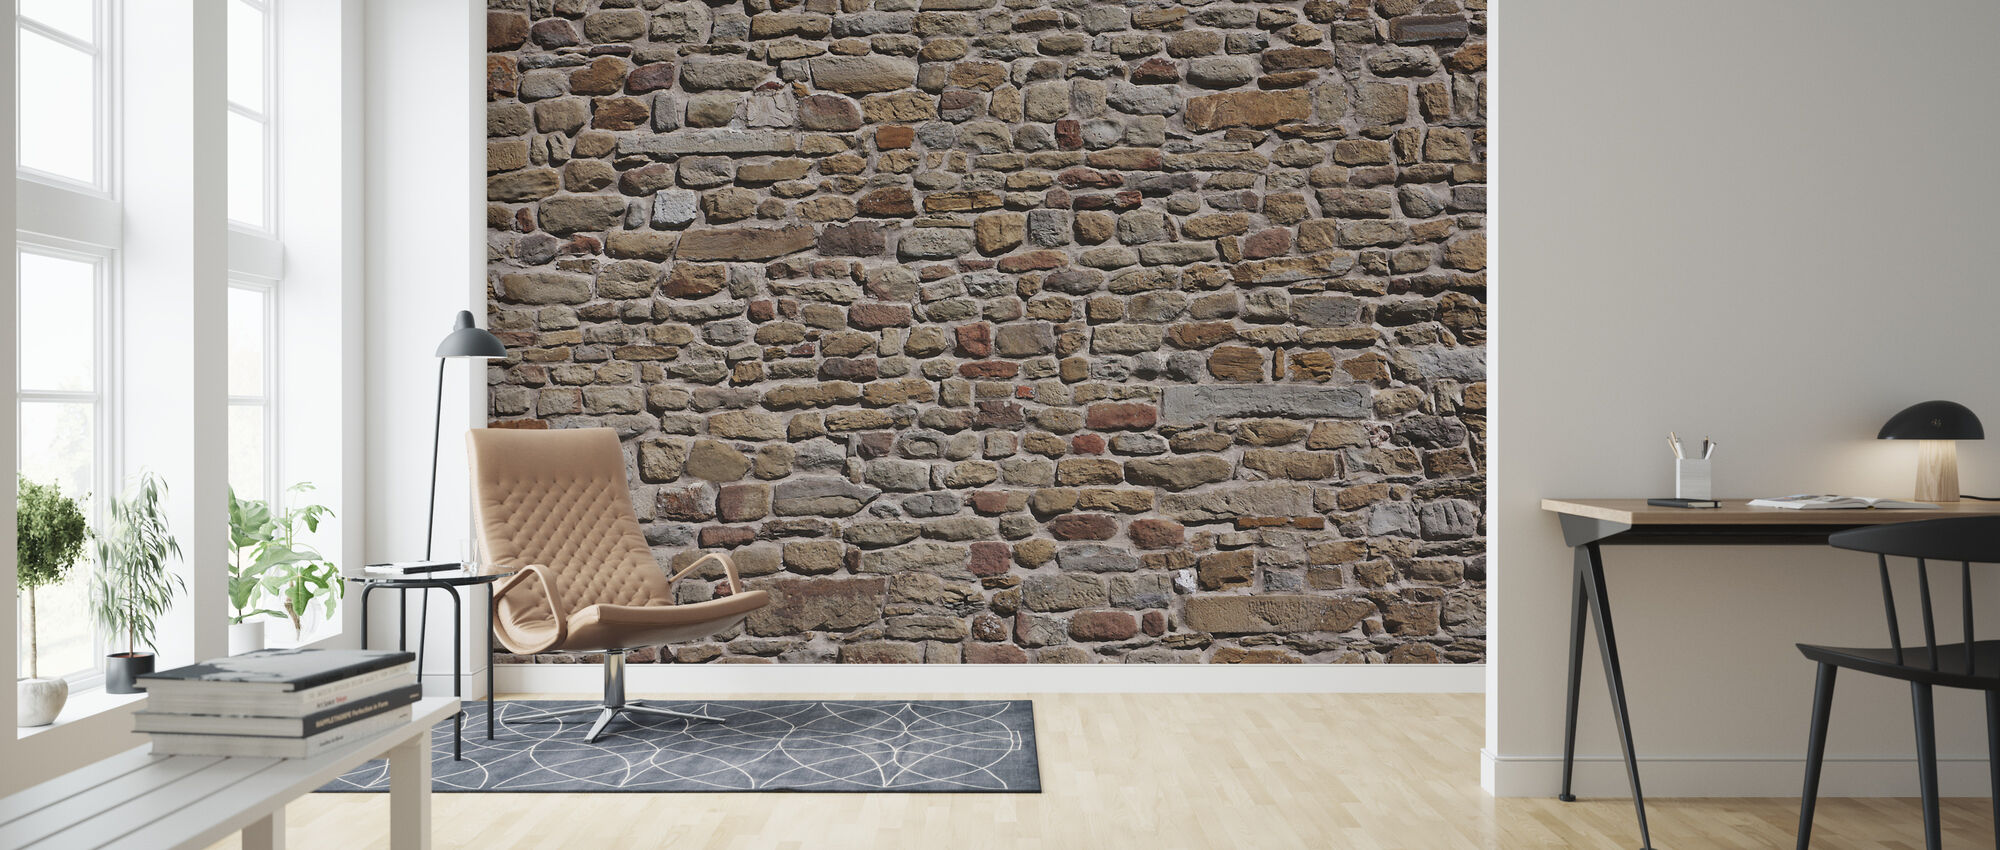 Old Brick Wall - Wallpaper - Living Room